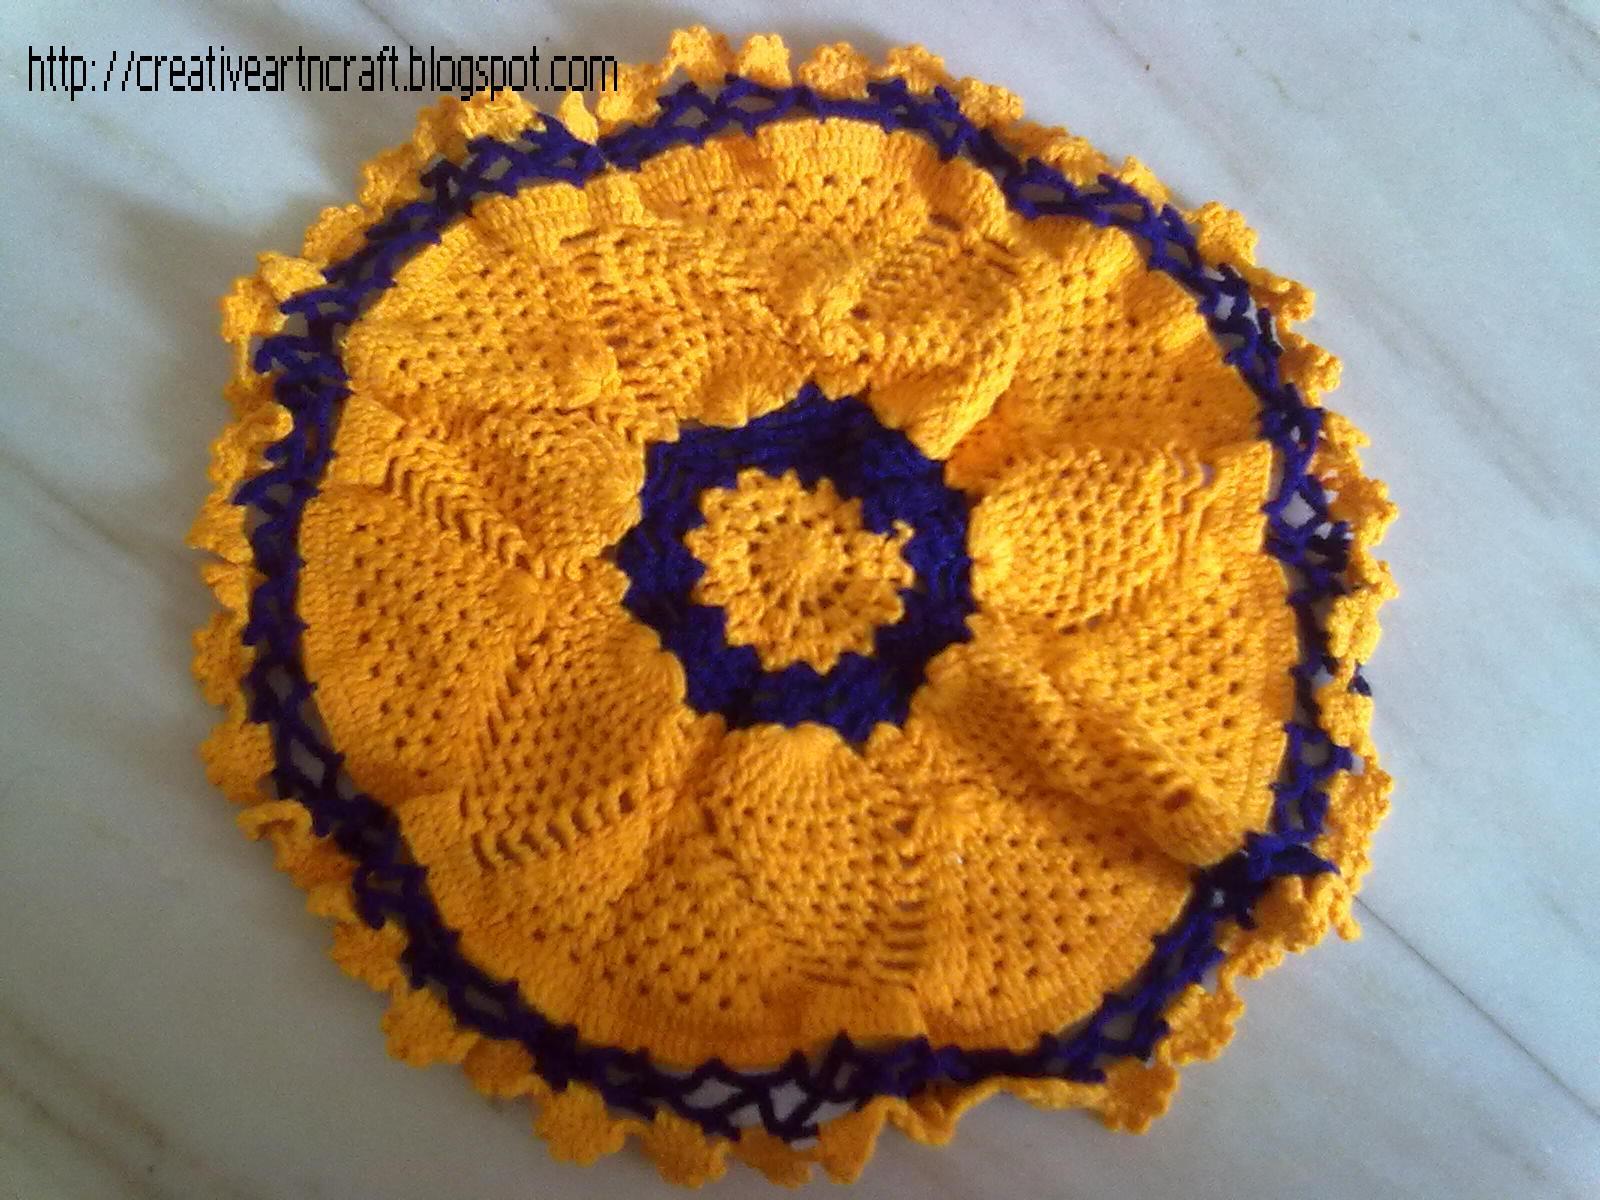 Crochet Today Tv - Crochet Club